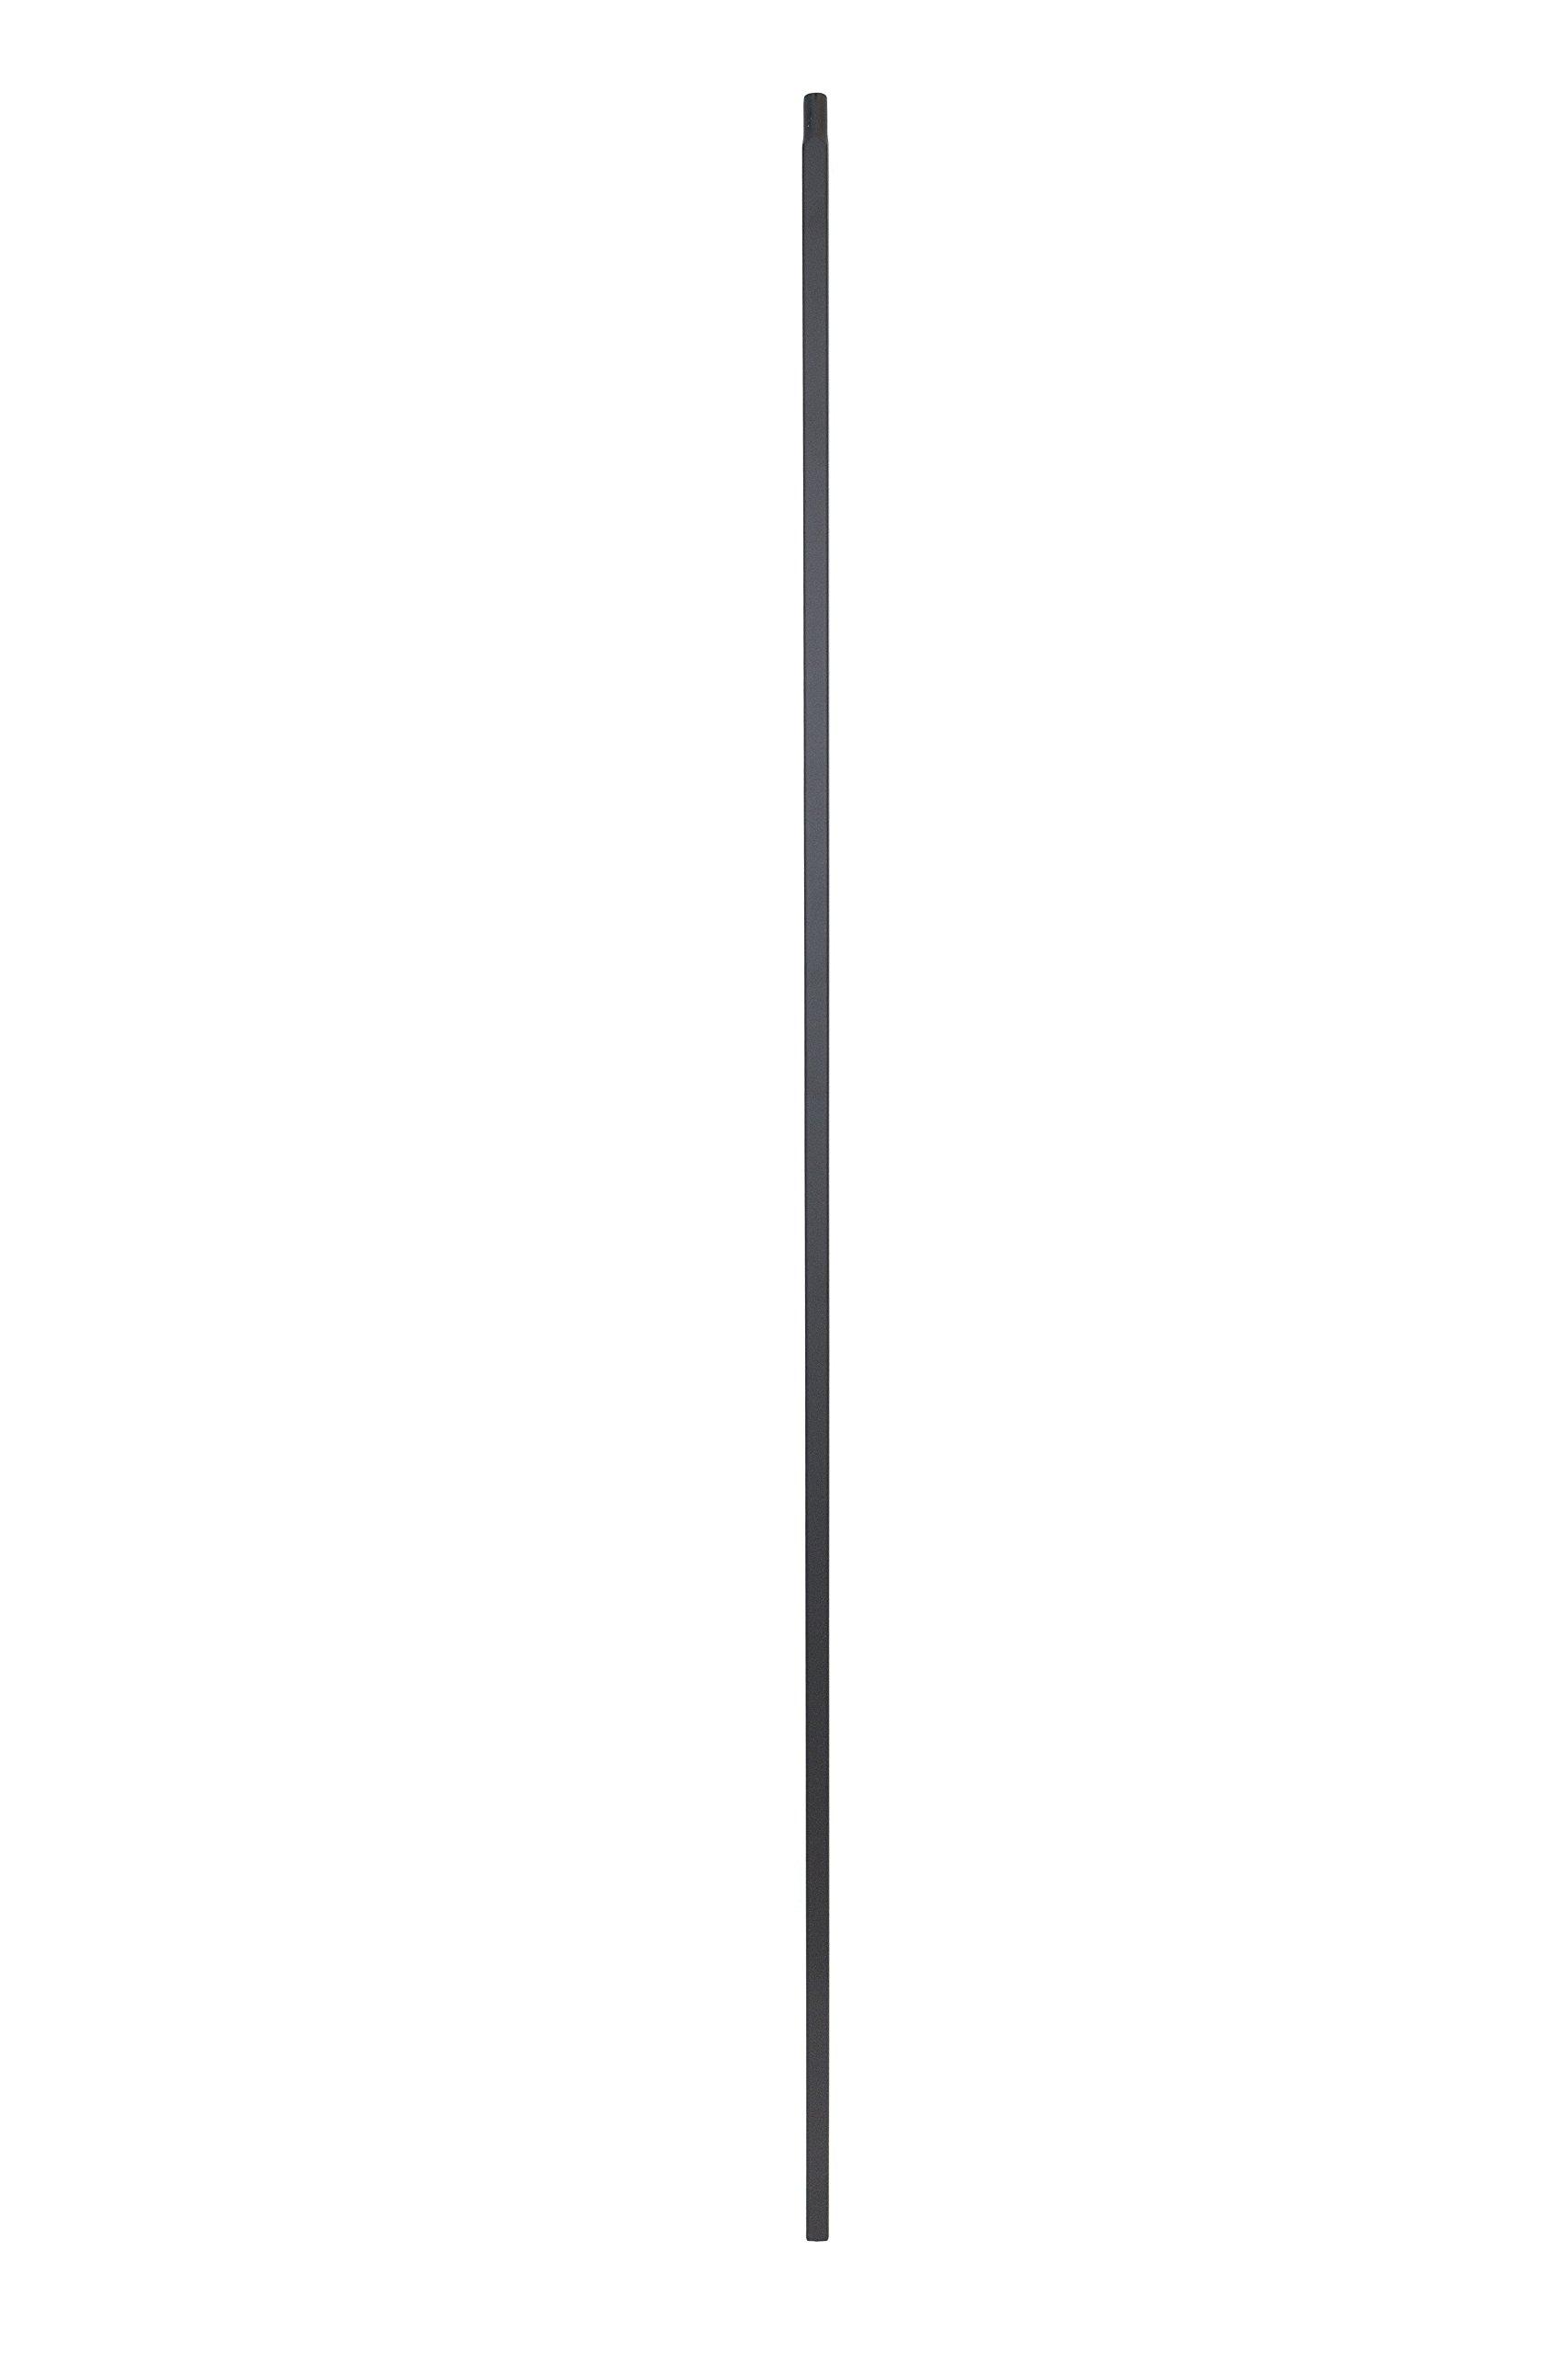 Iron Balusters - Standard Plain - Hollow - 44'' Tall - 1/2'' Square - Box of 15 (Satin Black)